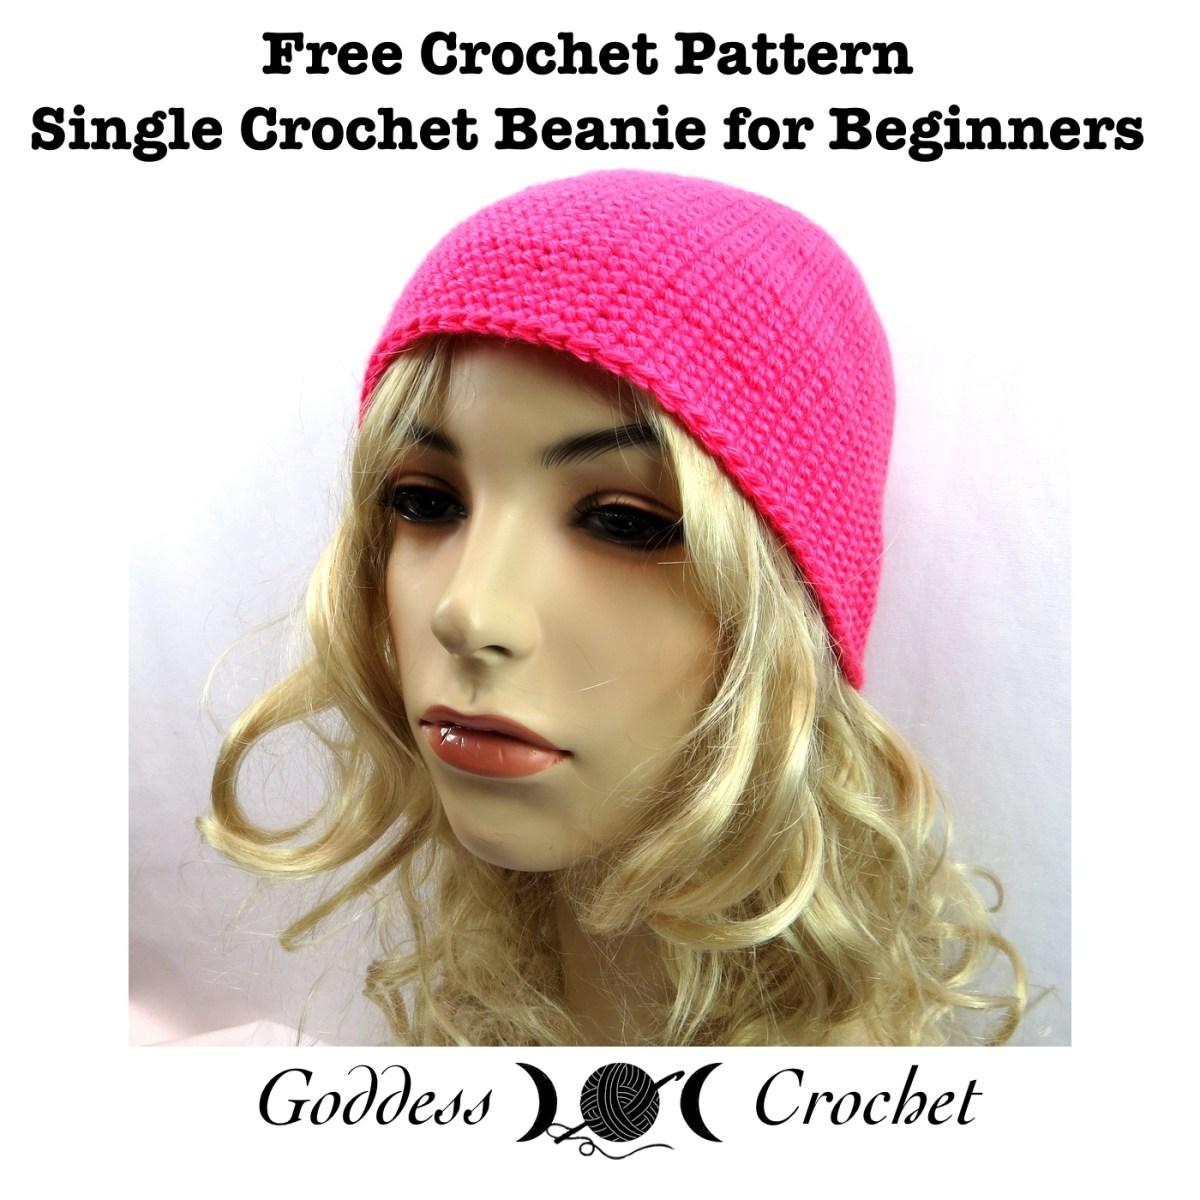 Single Crochet Beanie For Beginners Free Crochet Pattern With